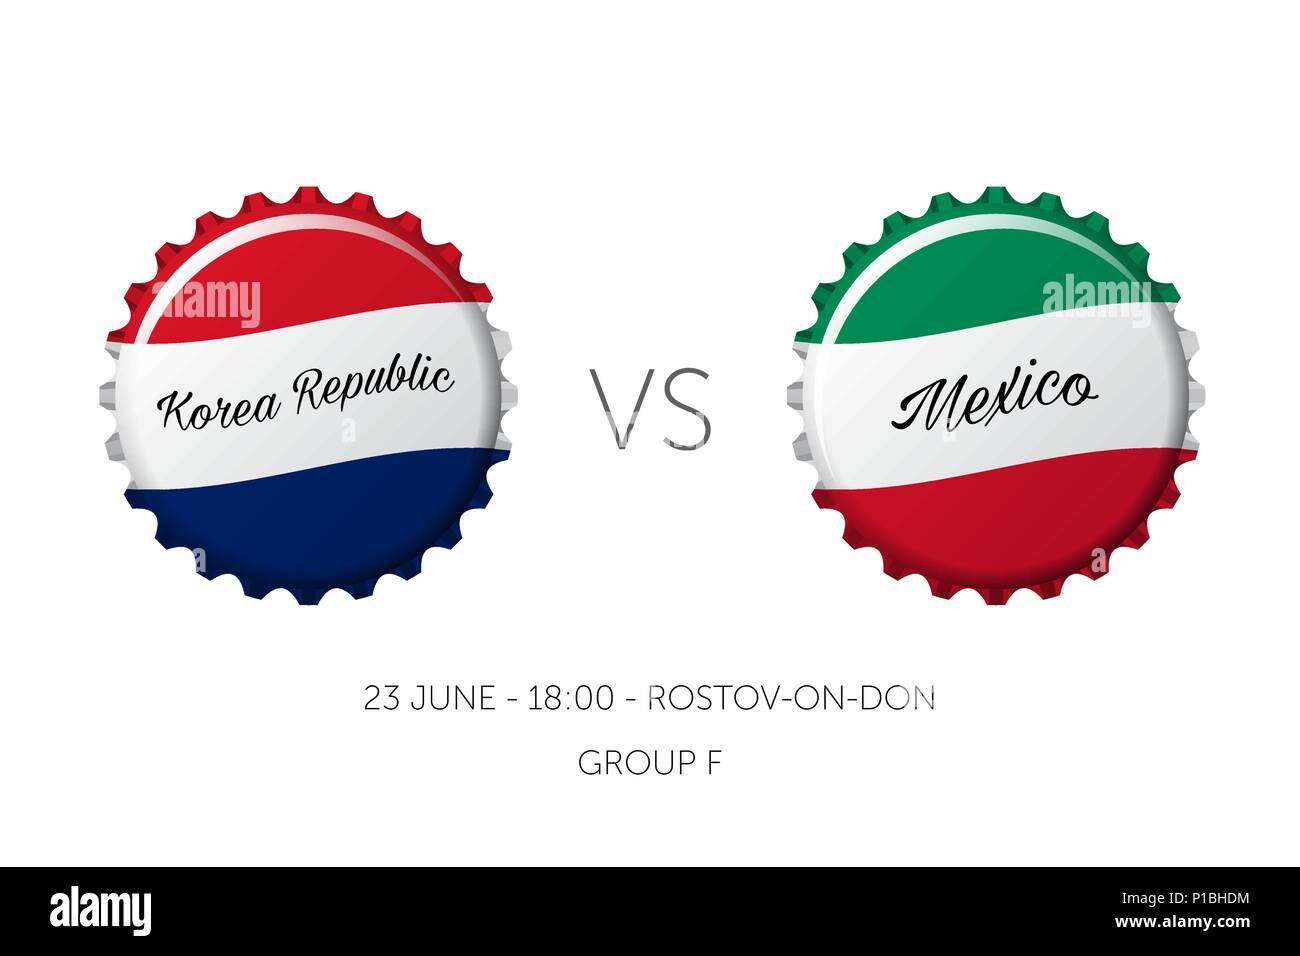 Soccer championship - Korea Republic VS Mexico - 23 June Stock Vector